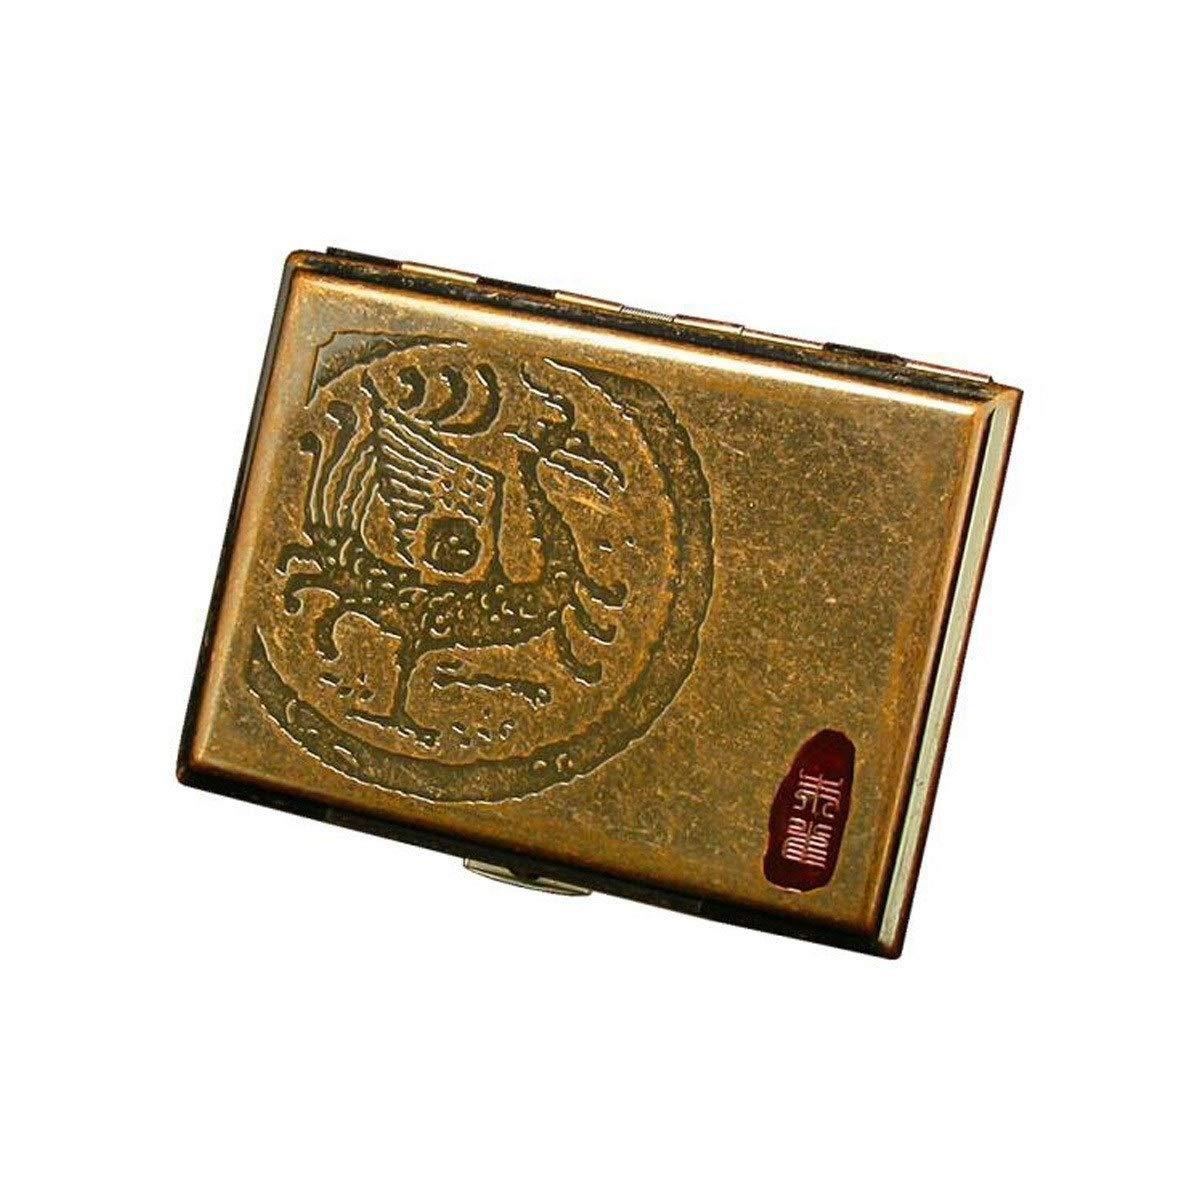 KALMAR Cigarette Case 16 Sticks, Portable Simple Retro Cigarette Case Creative Retro Copper, Ancient Beast, Suzaku, Qinglong White Tiger, Xuanwu Cigarette Case, Is The Ideal Gift For Smokers Cigarette